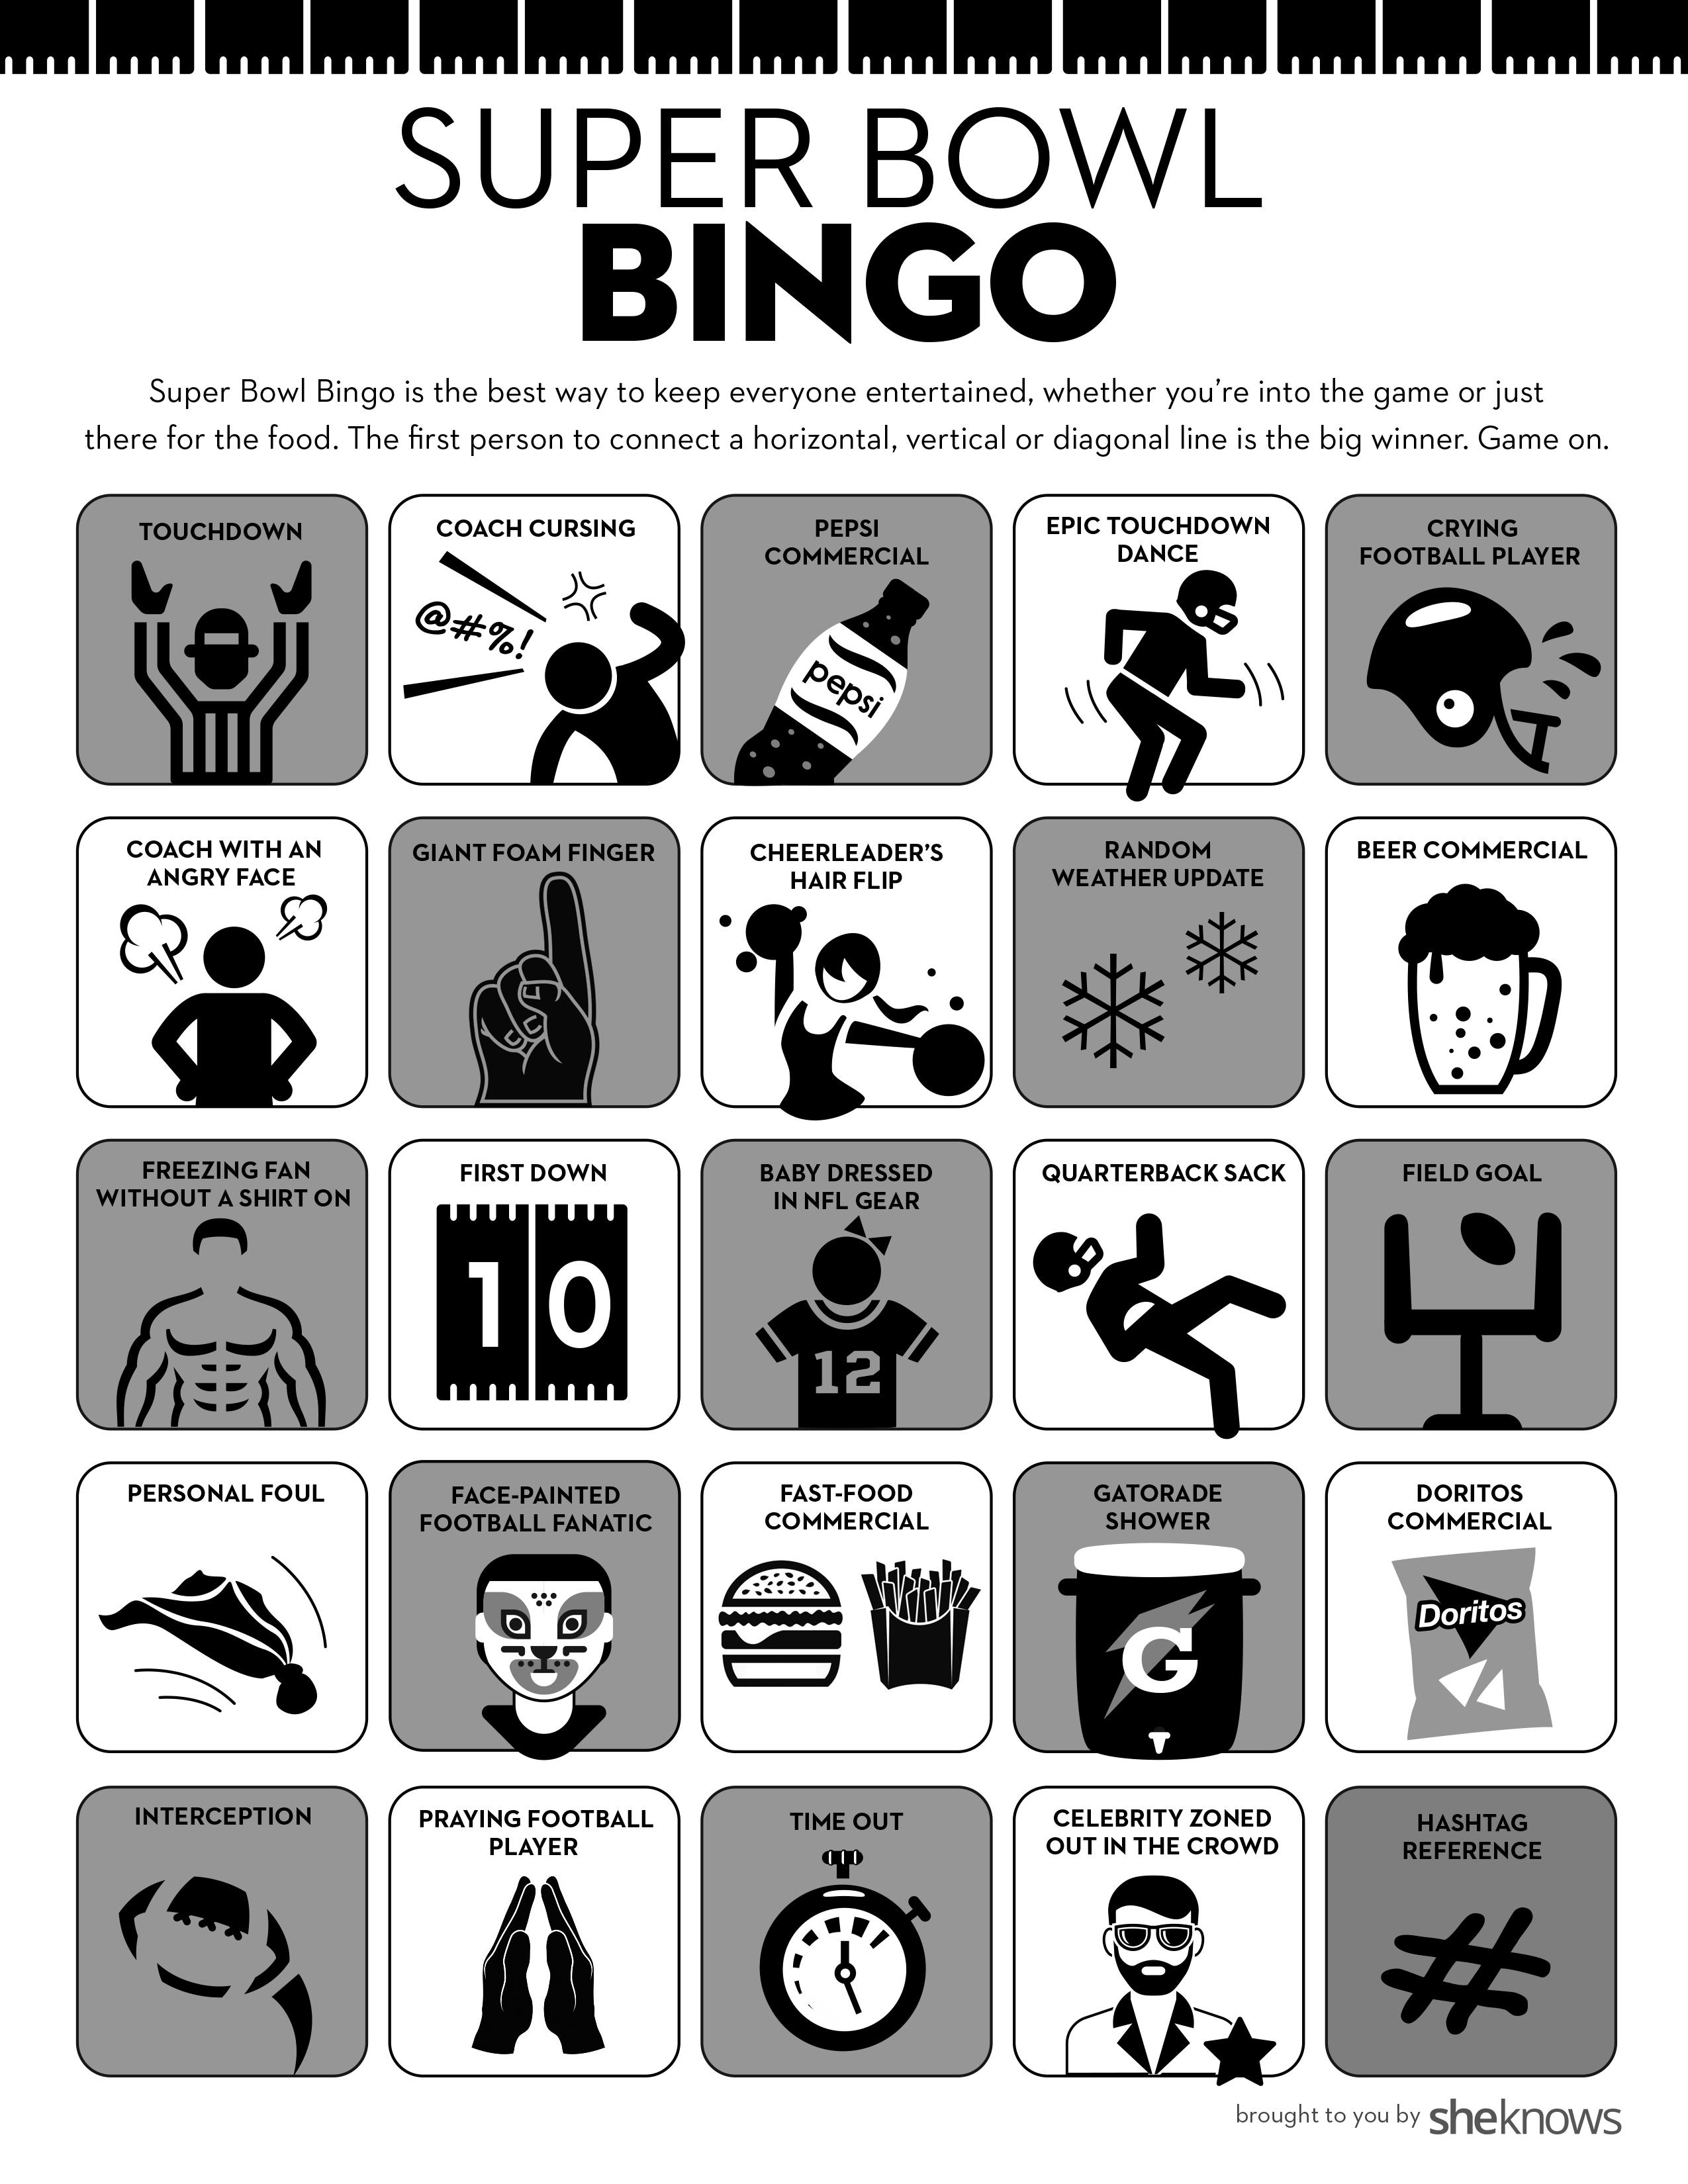 superbowl_bingo4.jpg